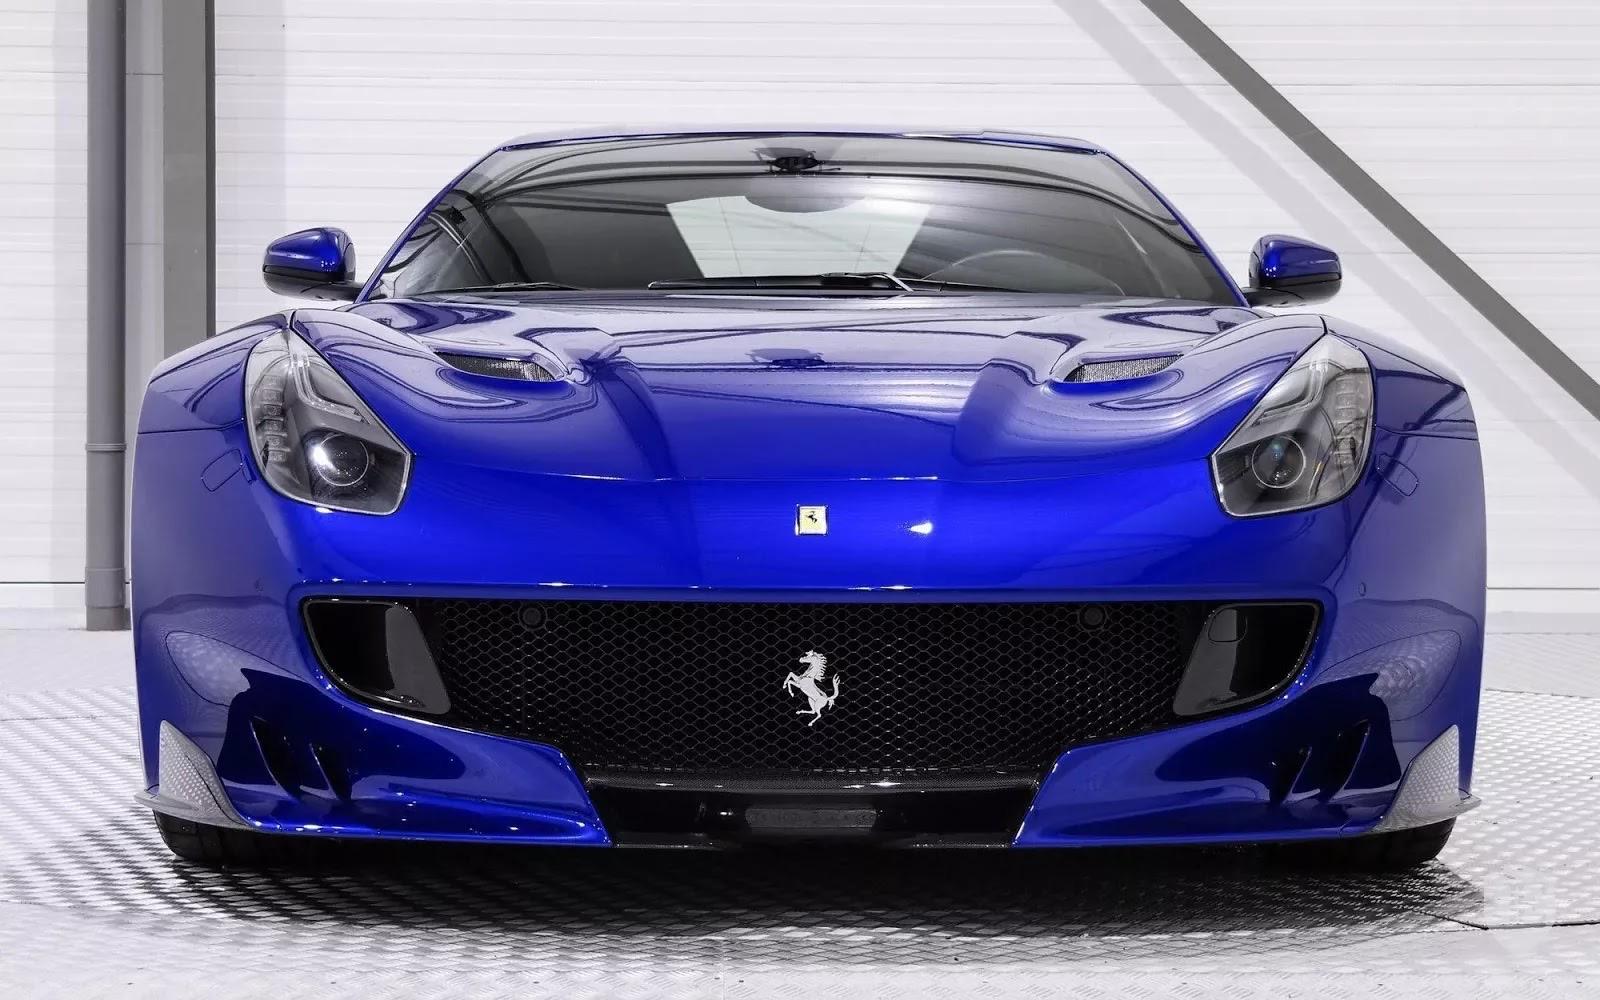 One-Off_Electric_Blue_Ferrari_F12tdf_04